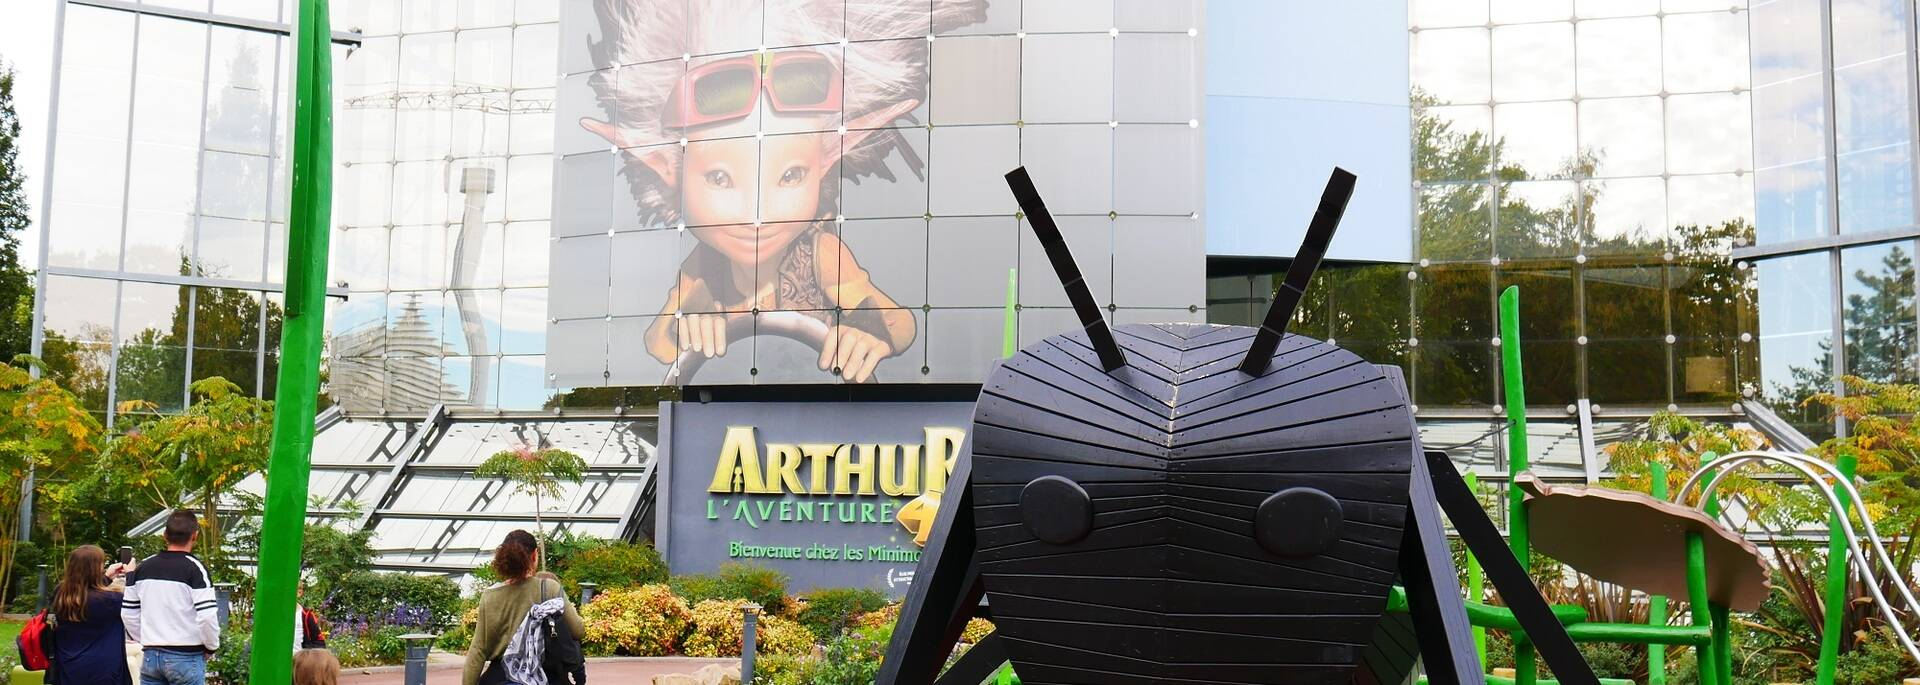 L'attraction Arthur et les Minimoys au Futuroscope - ©FDHPA17 / P.Migaud